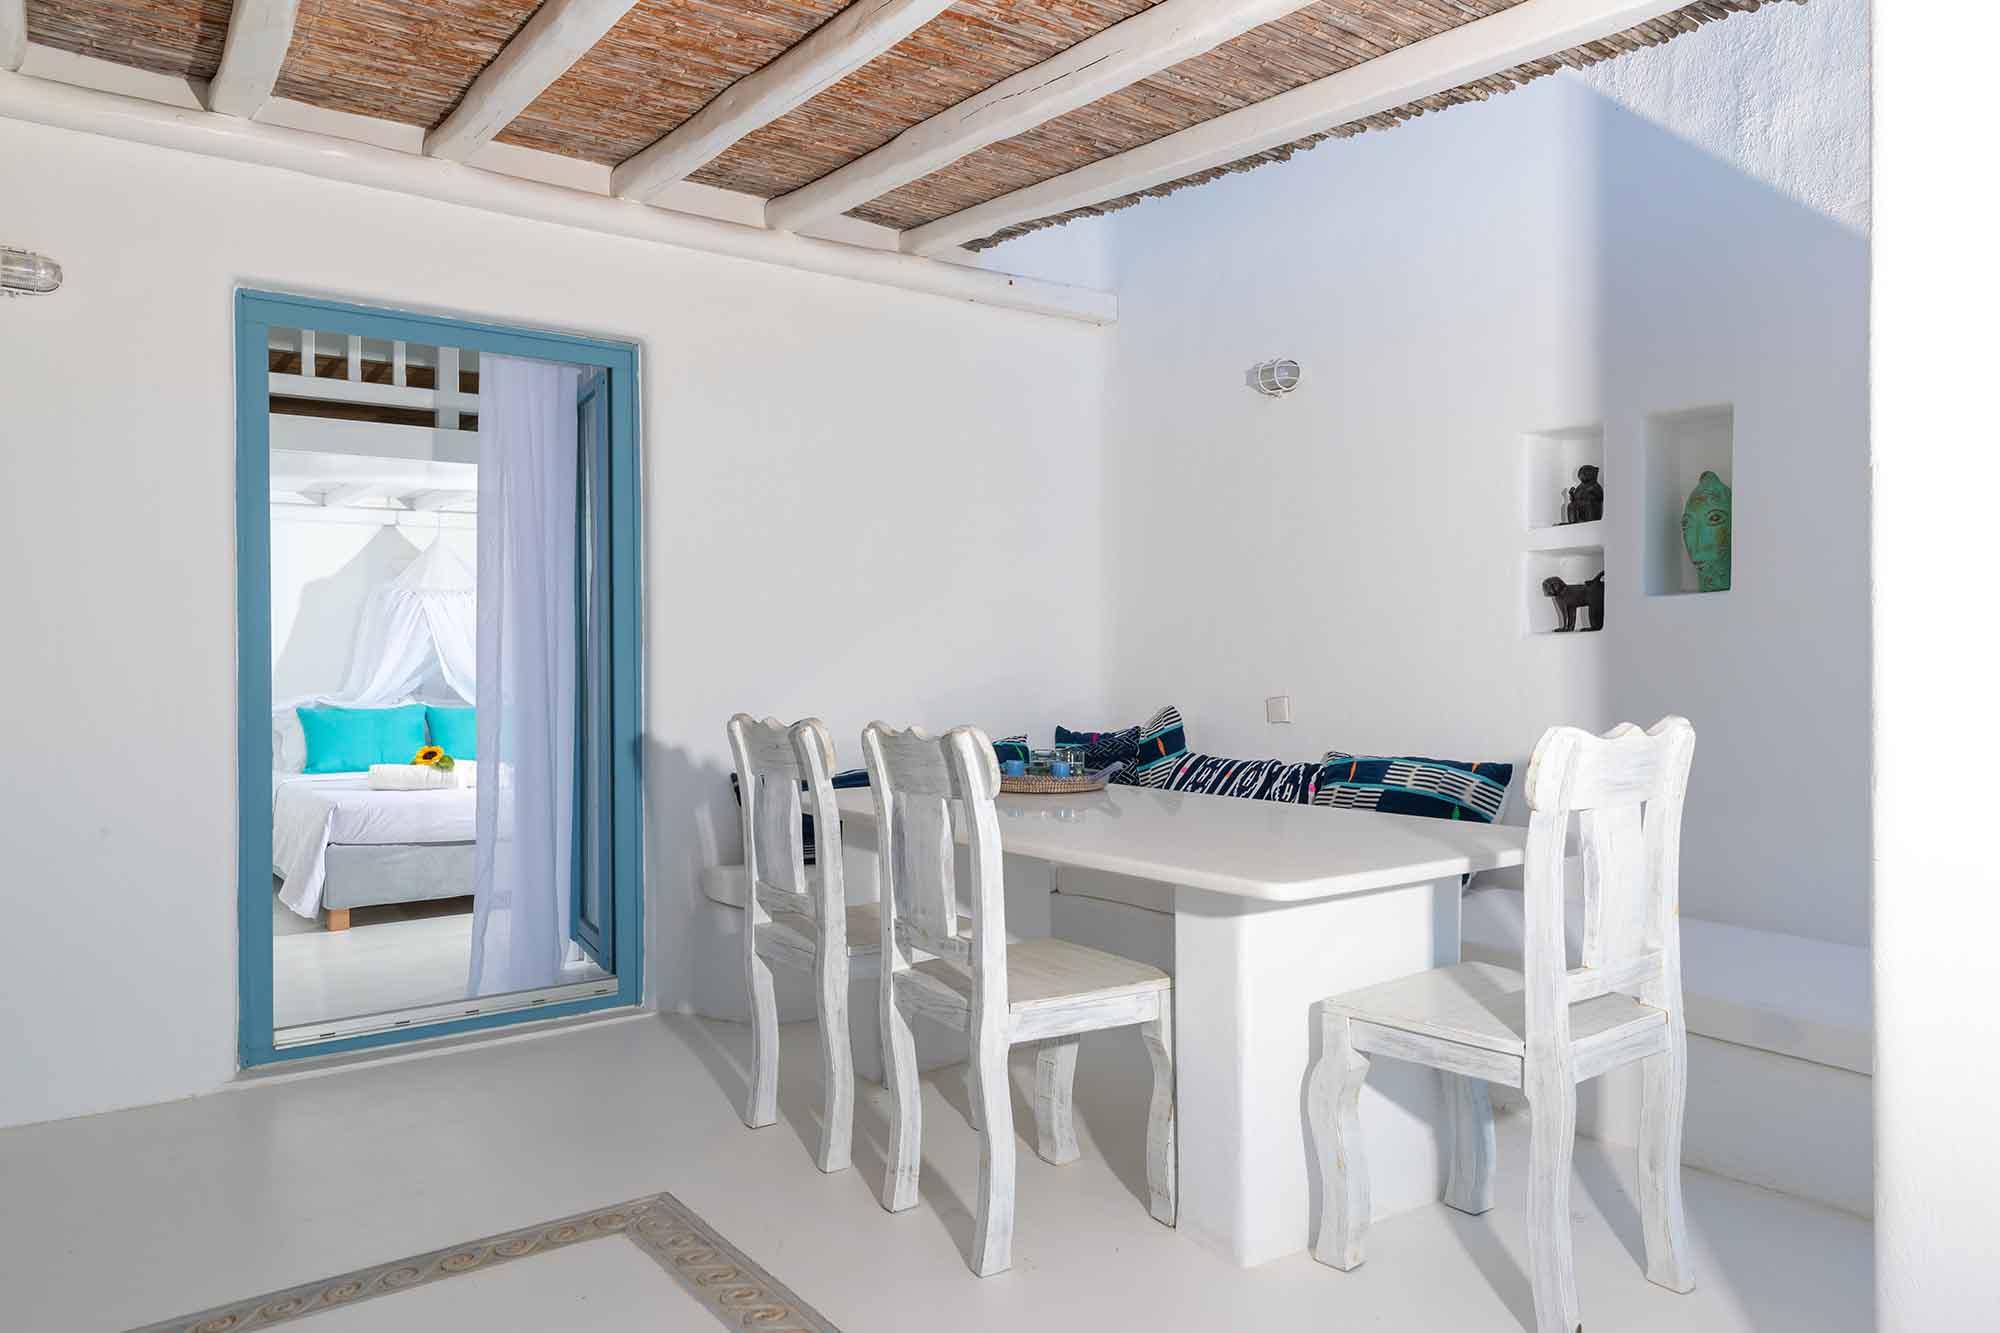 RENT A LUXURIOUS VILLA BY THE SEA IN MYKONOS - VILLA KARKOS - dining room